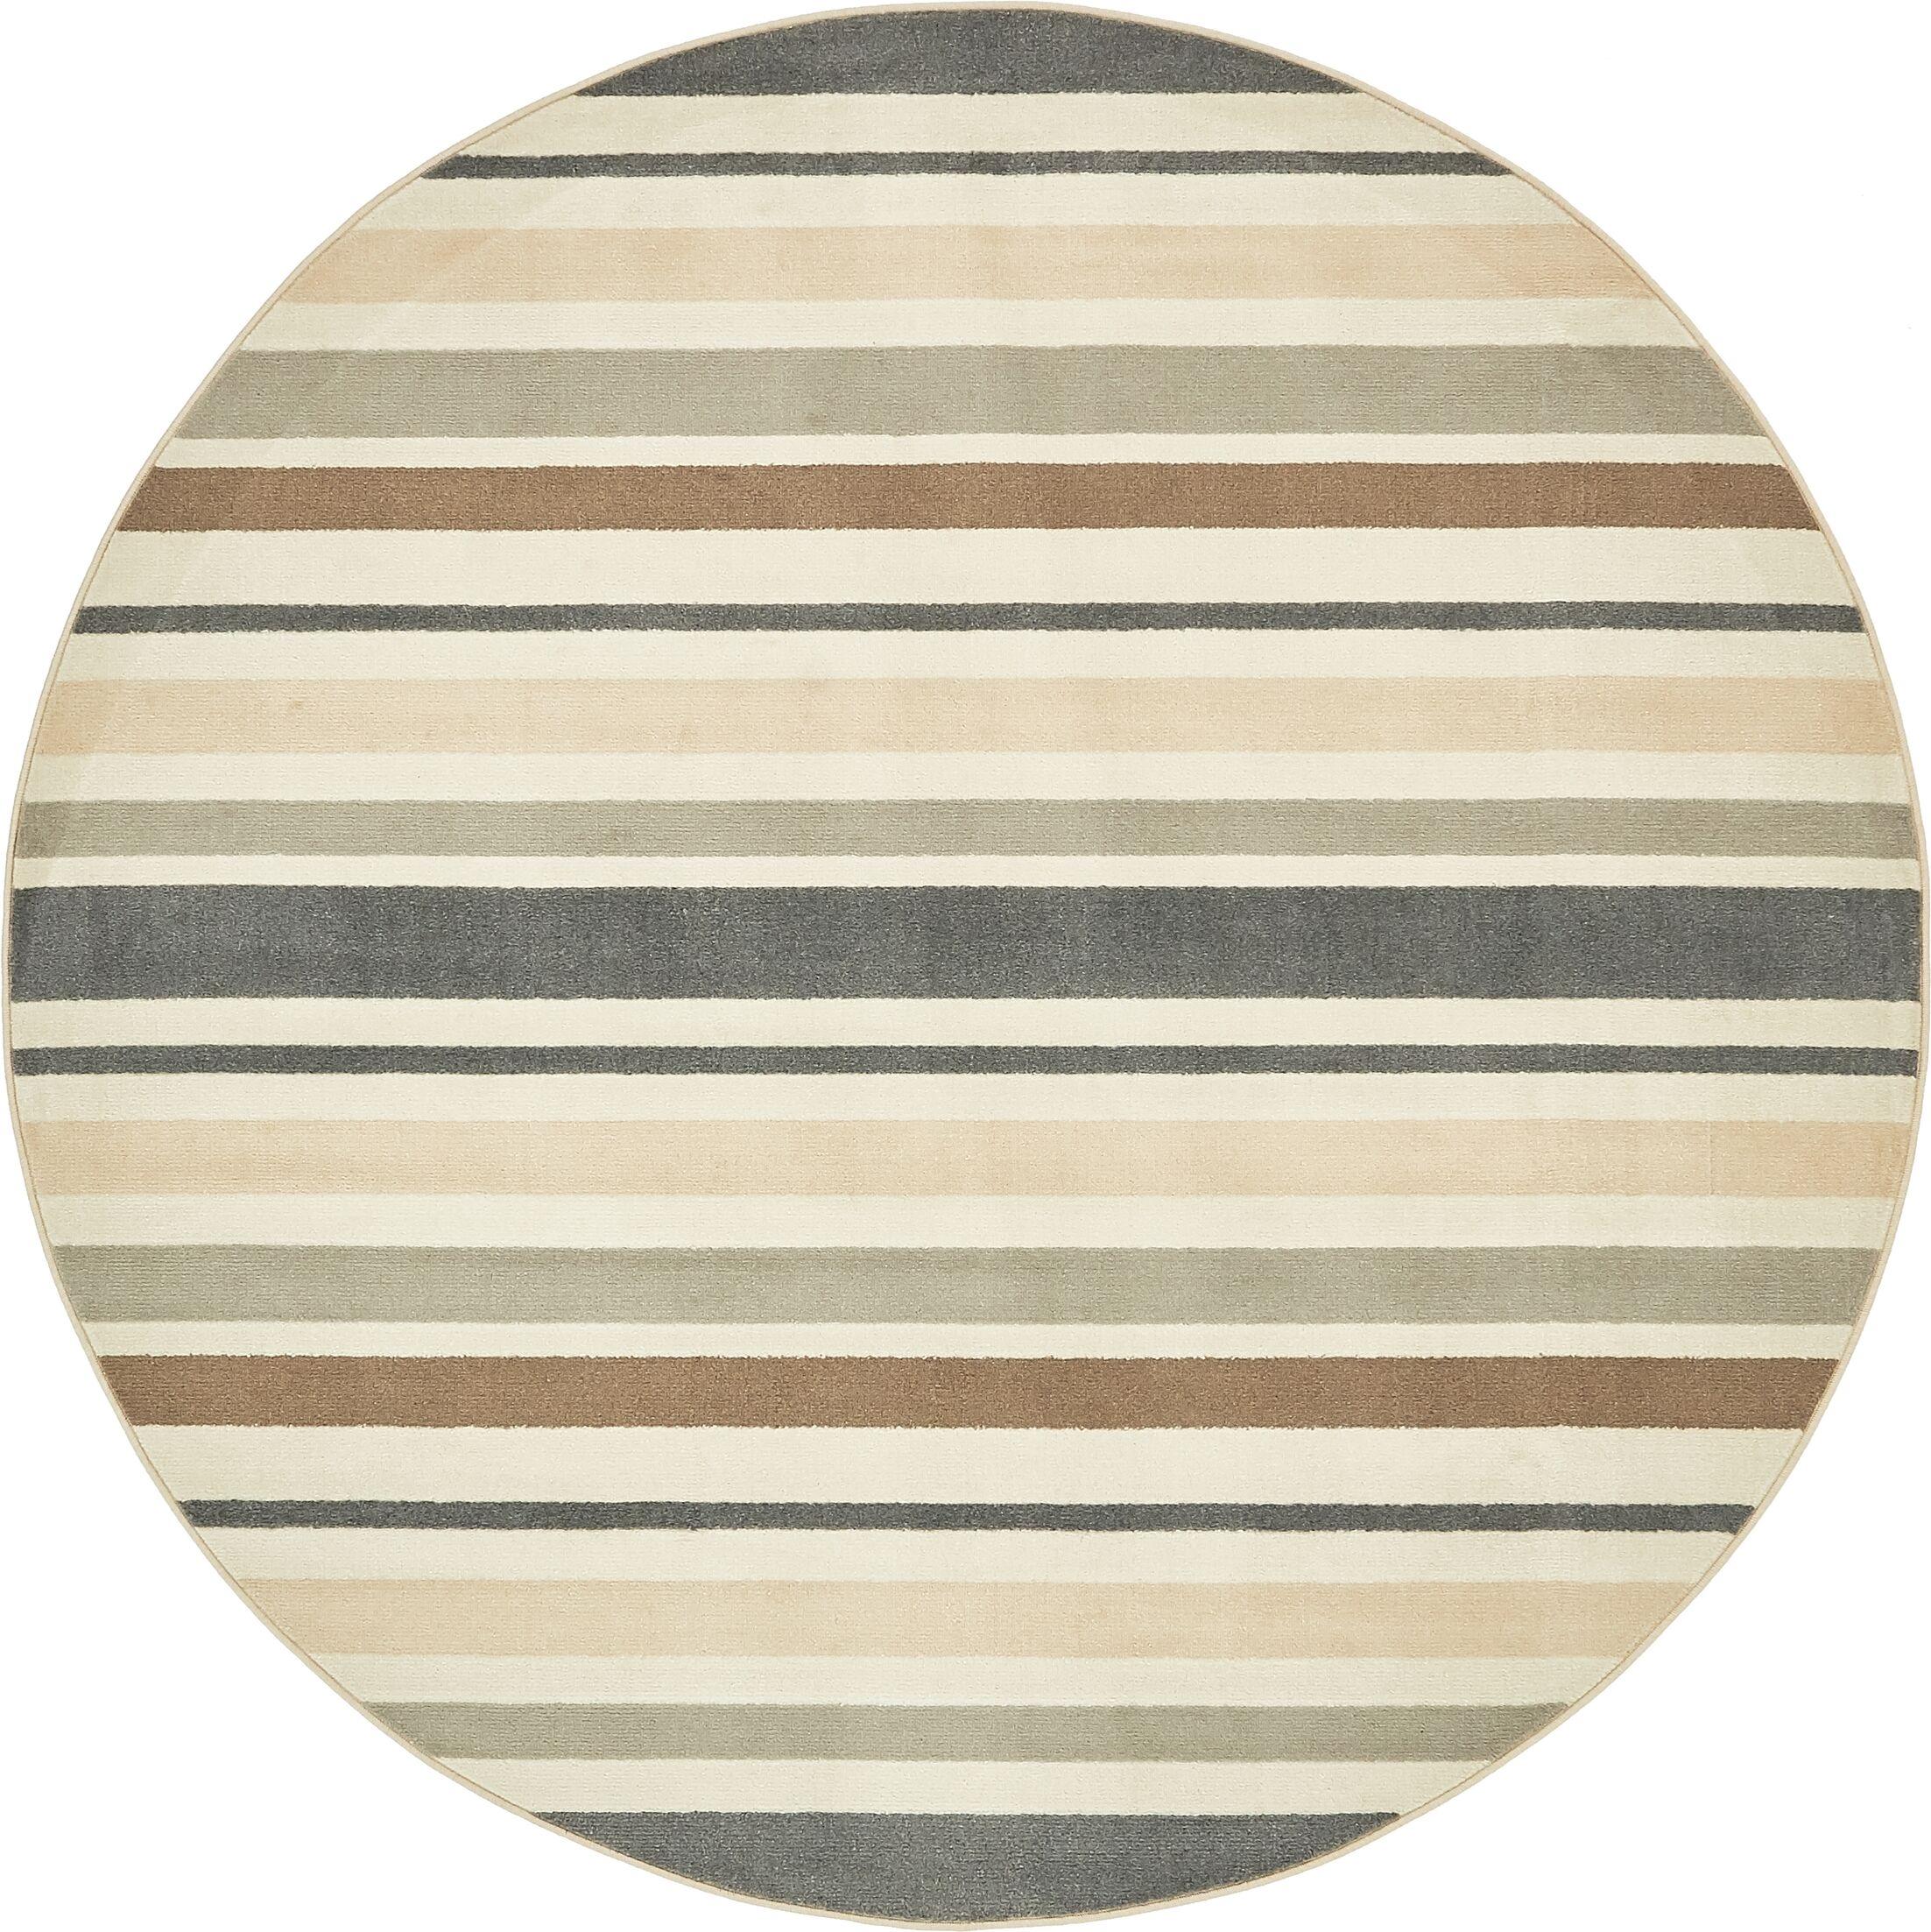 Giovanni Beige/Brown Area Rug Rug Size: Round 8'